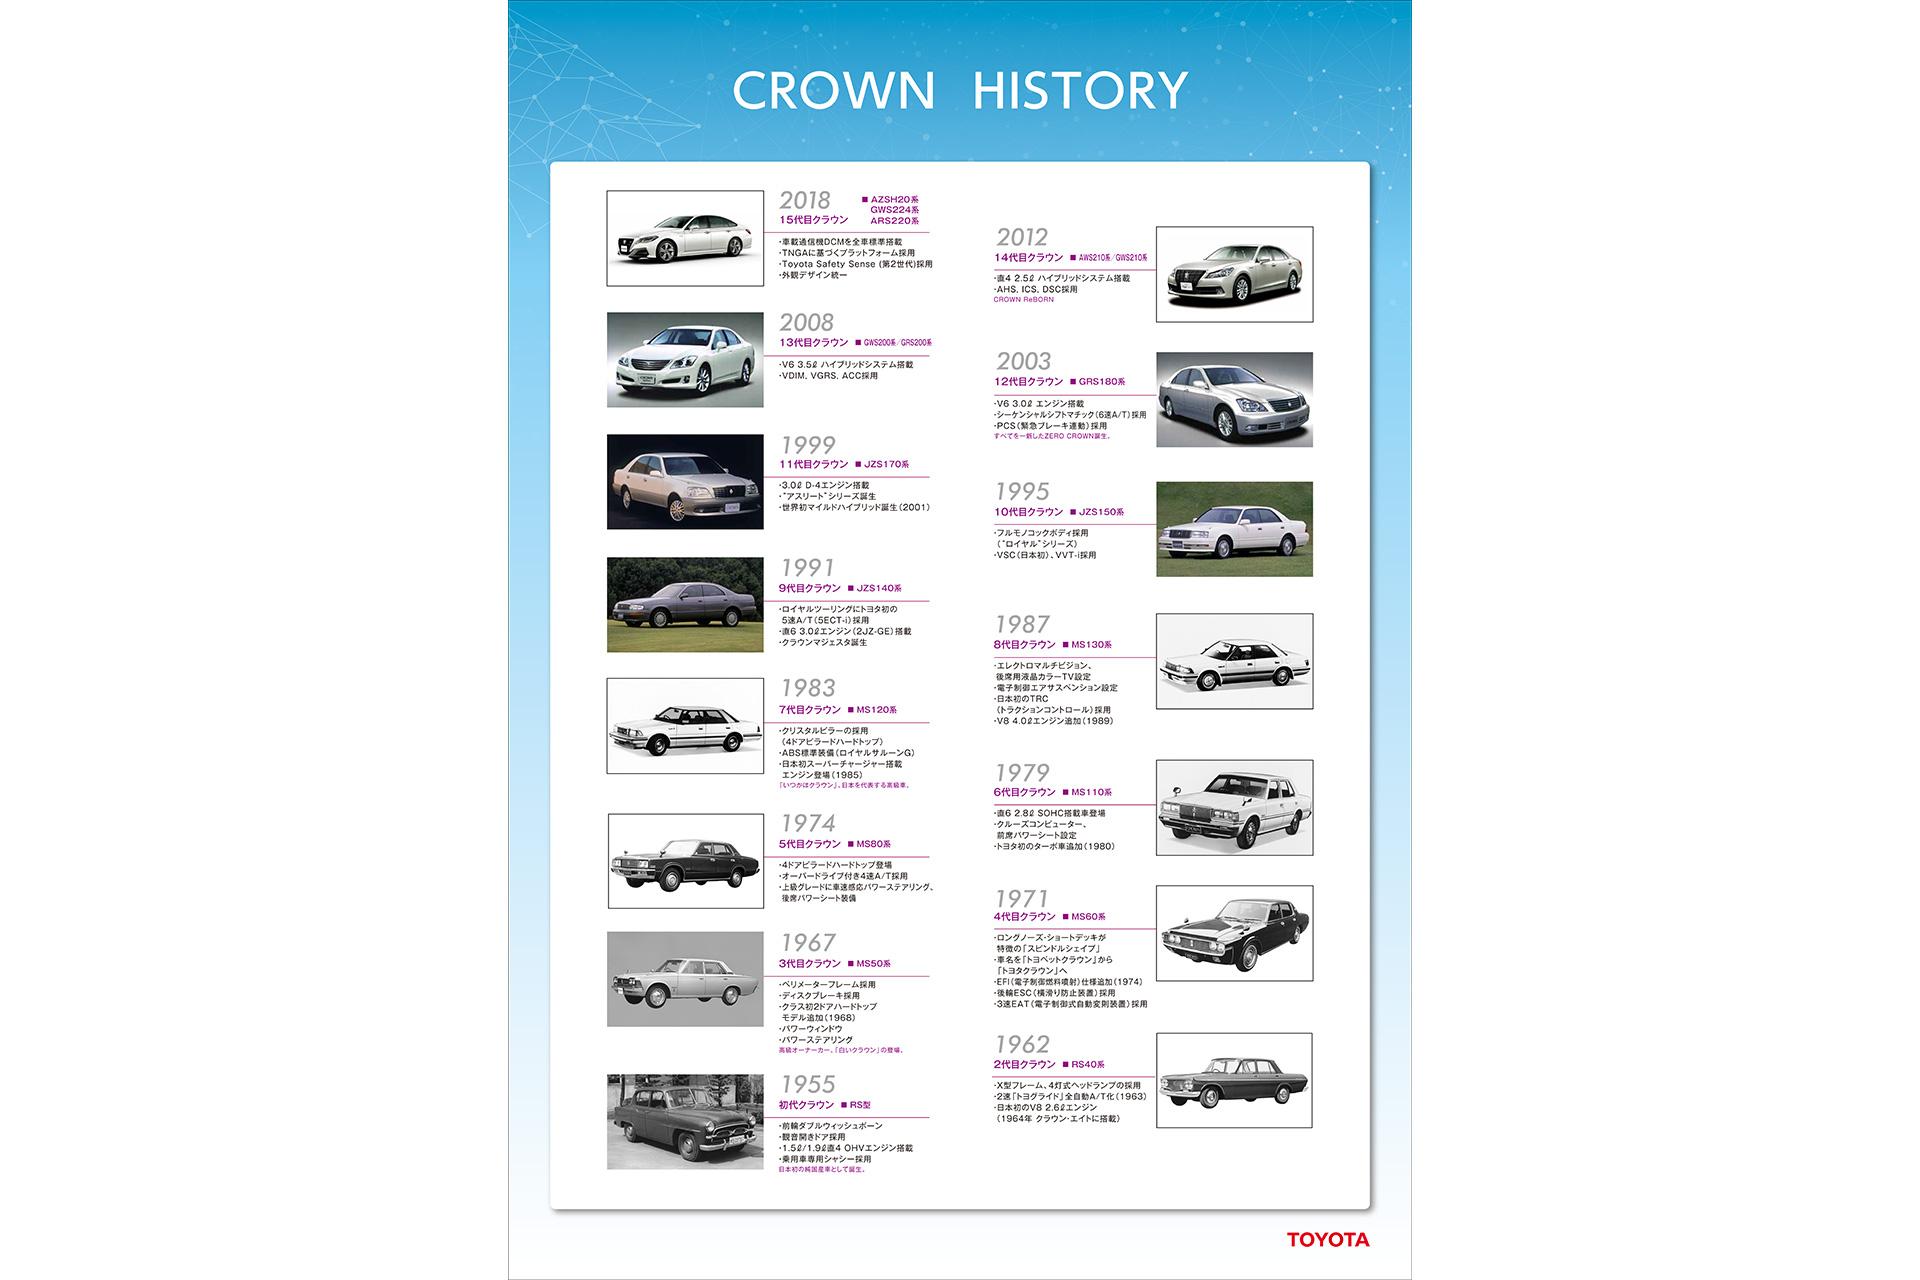 CROWN HISTORY